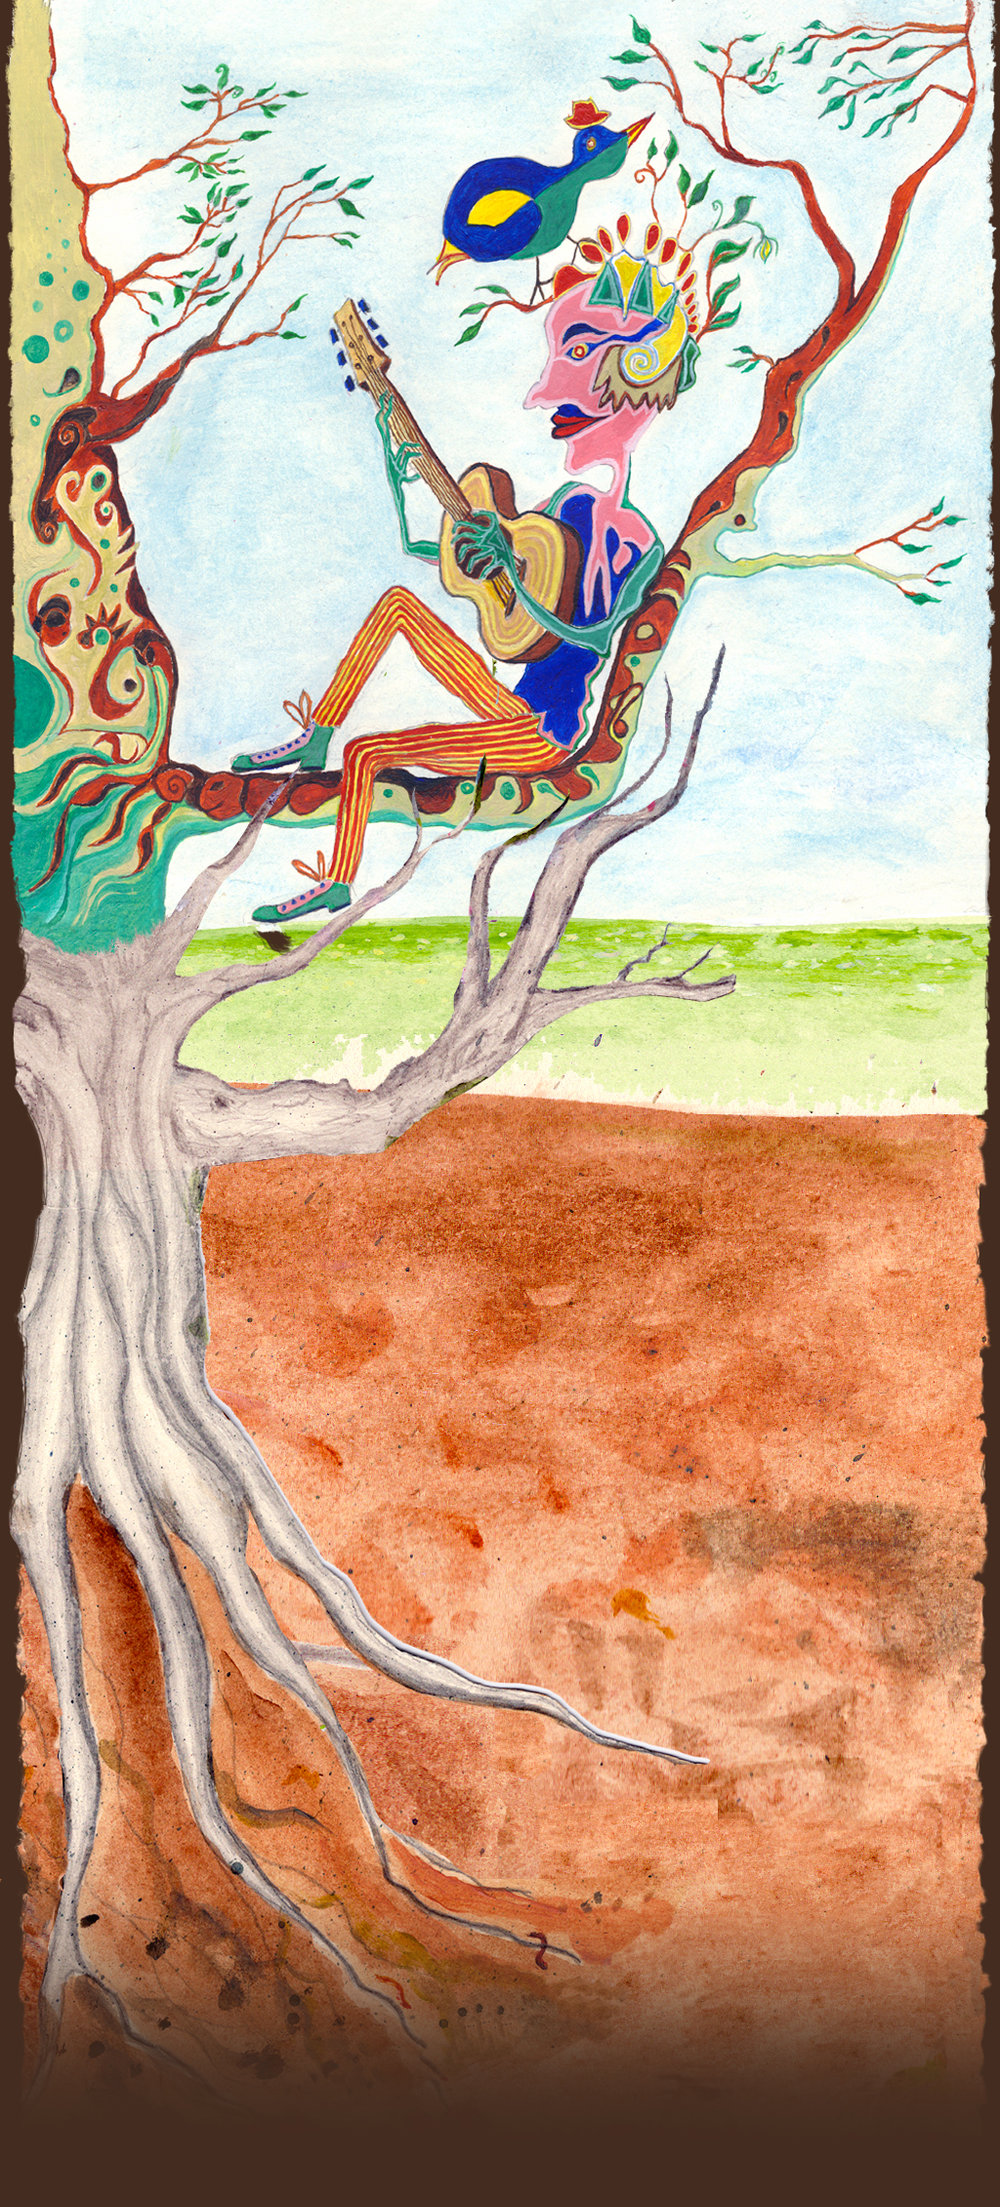 Man-in-tree-rootsFLAT1024px.jpg